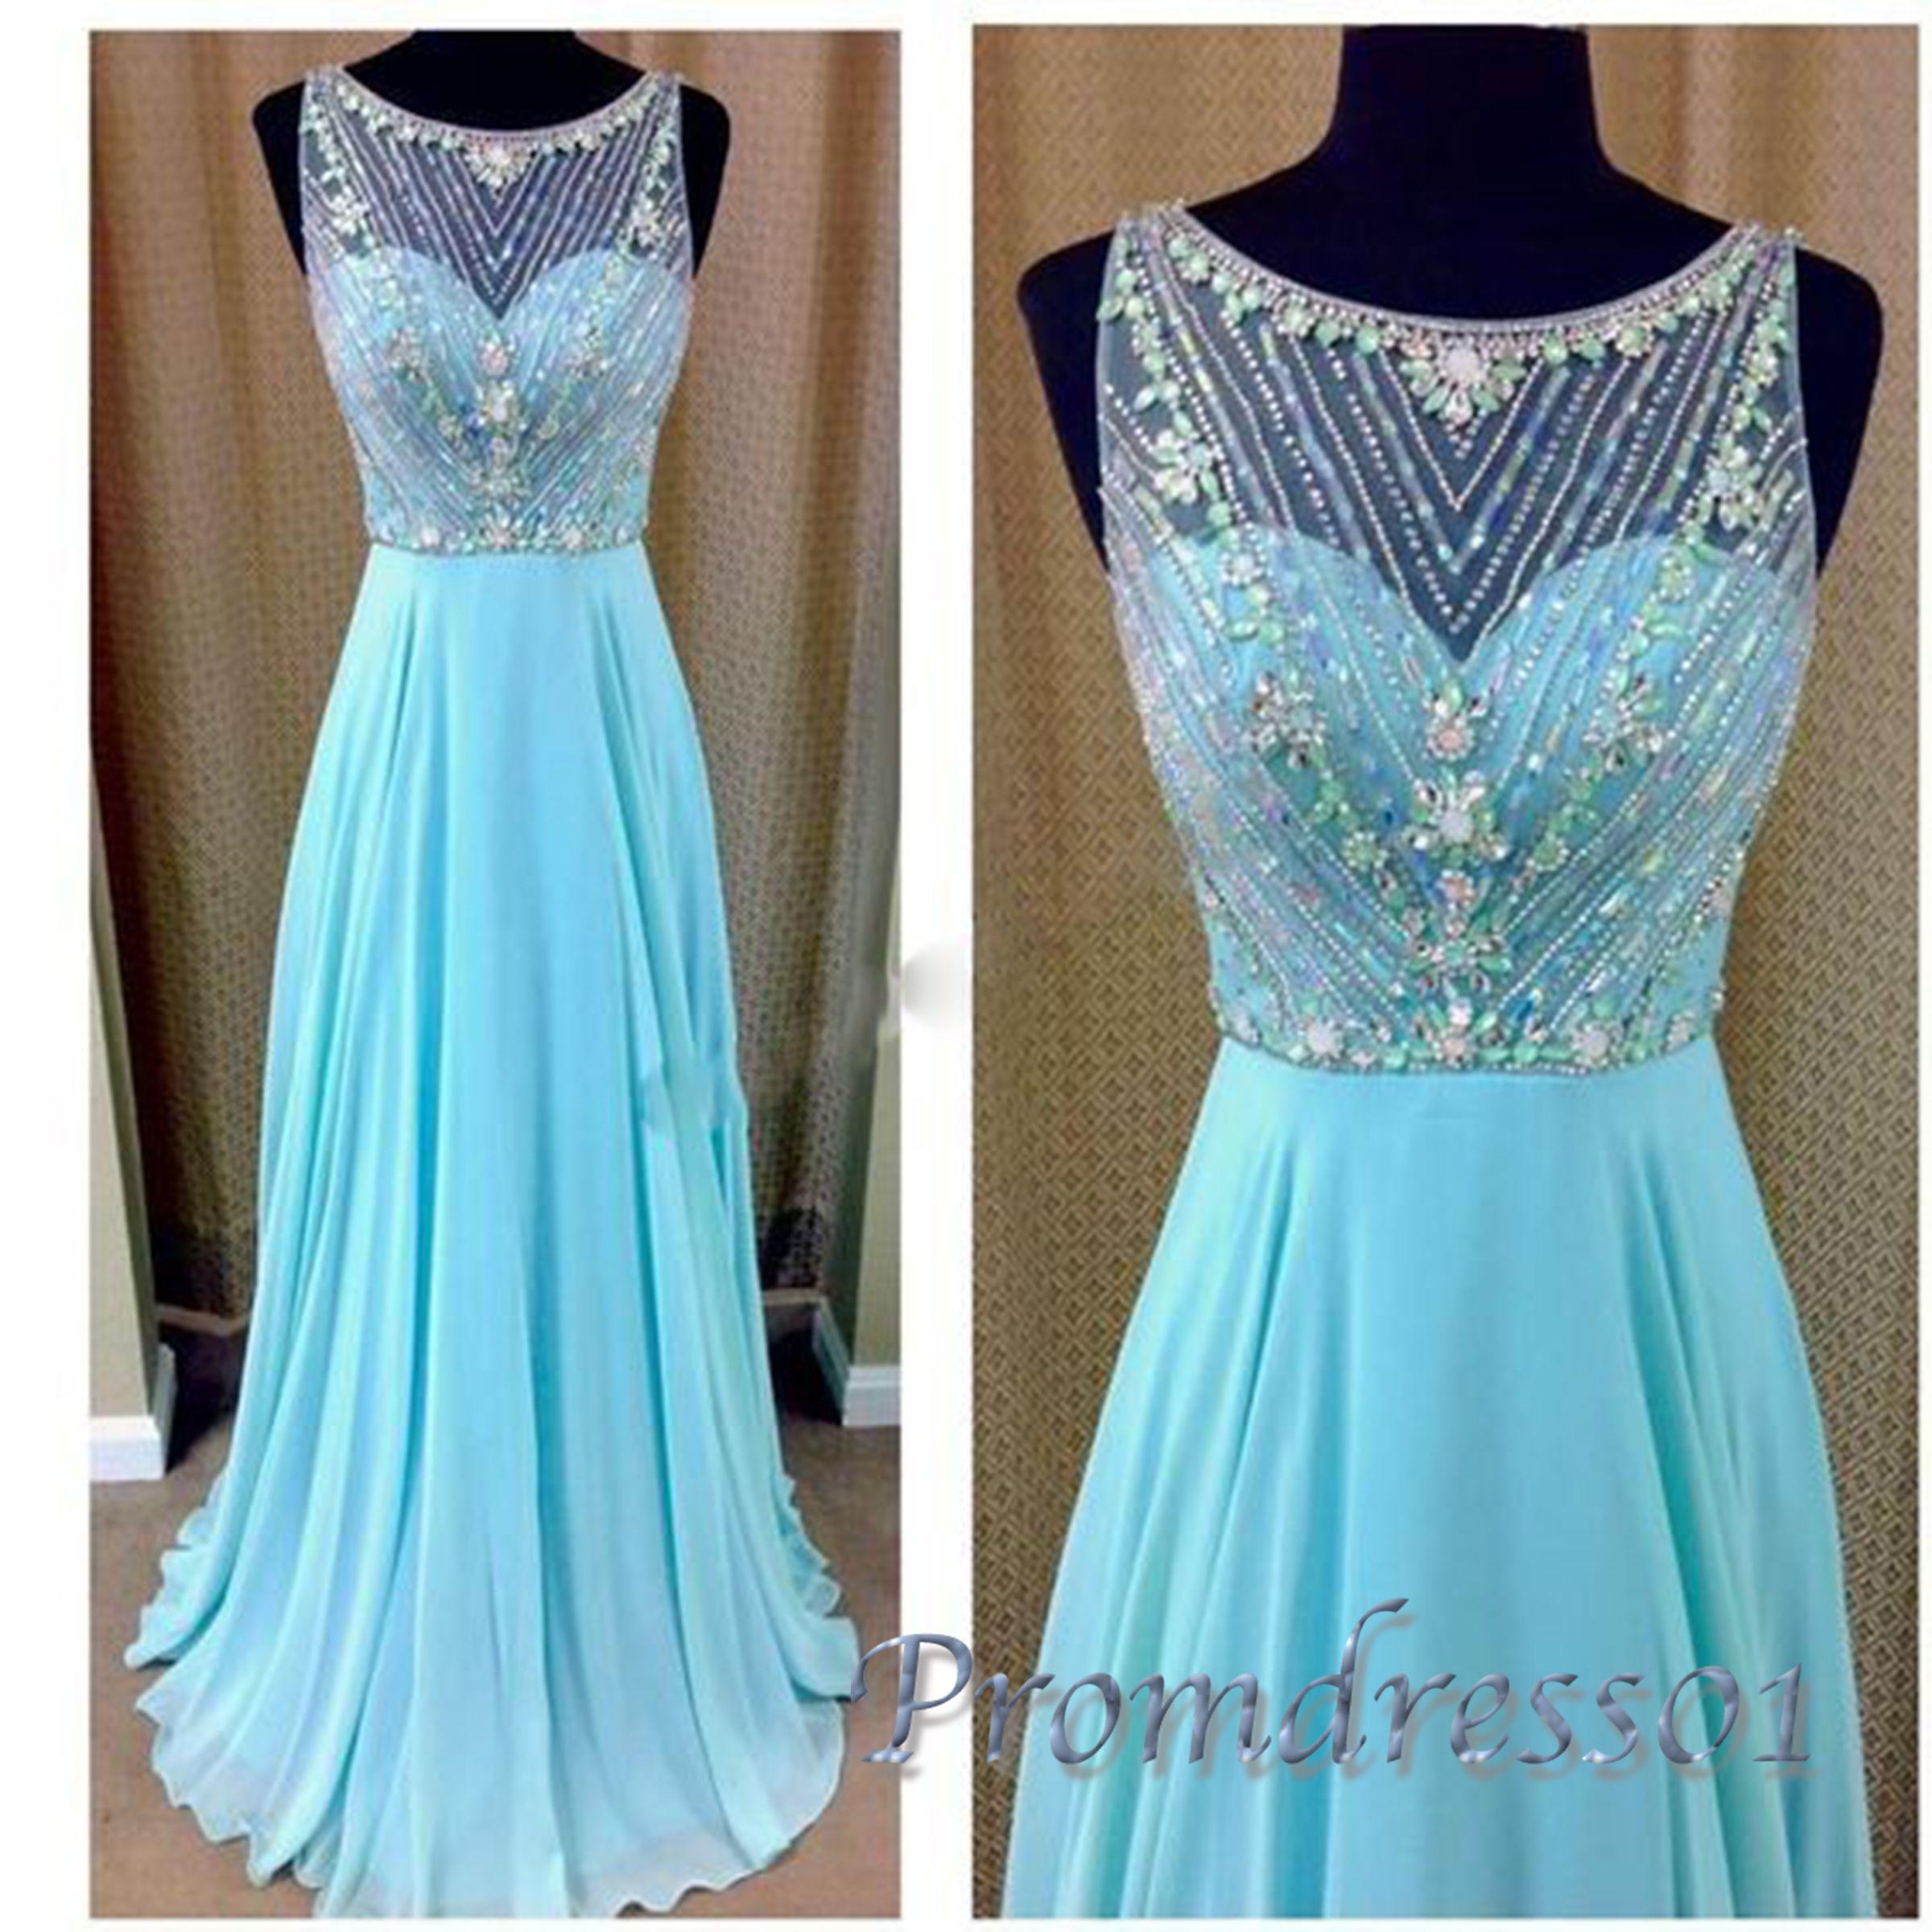 Cute light blue chiffon long prom dress for teens, homecoming dress ...